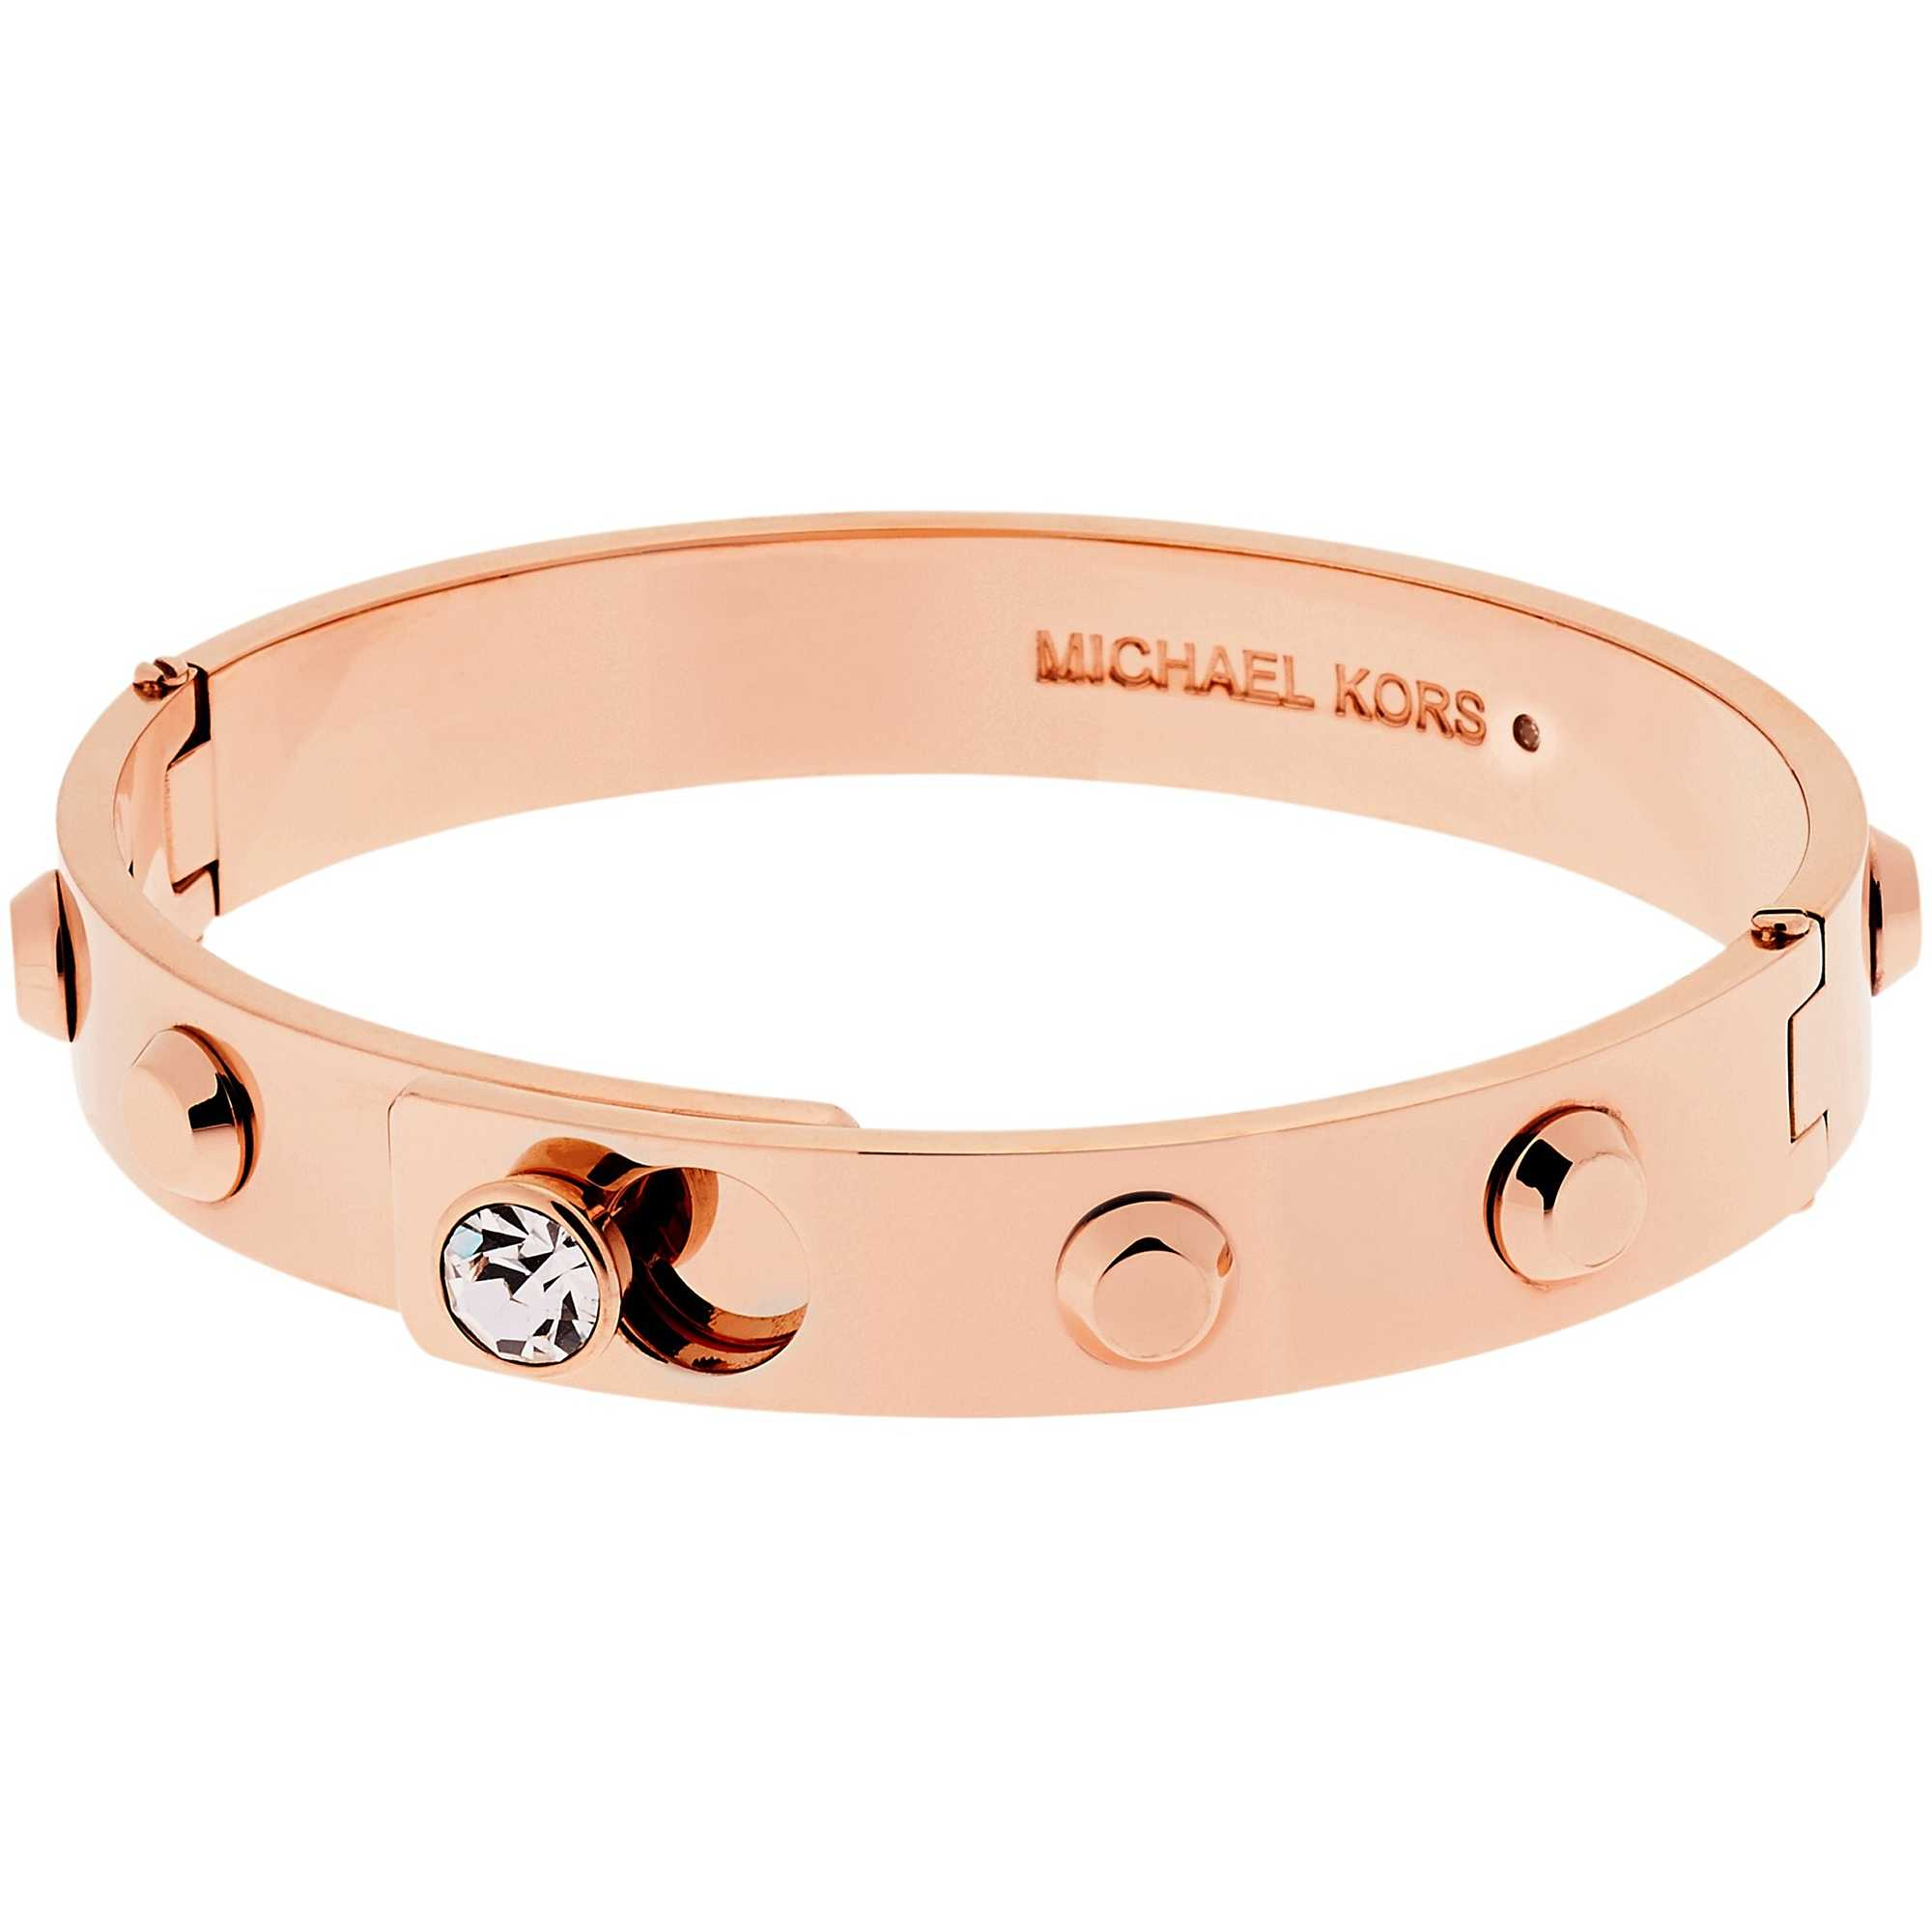 Bracelet Michael Kors Femme : bracelet femme bijoux michael kors mkj4552791 bracelets ~ Pogadajmy.info Styles, Décorations et Voitures